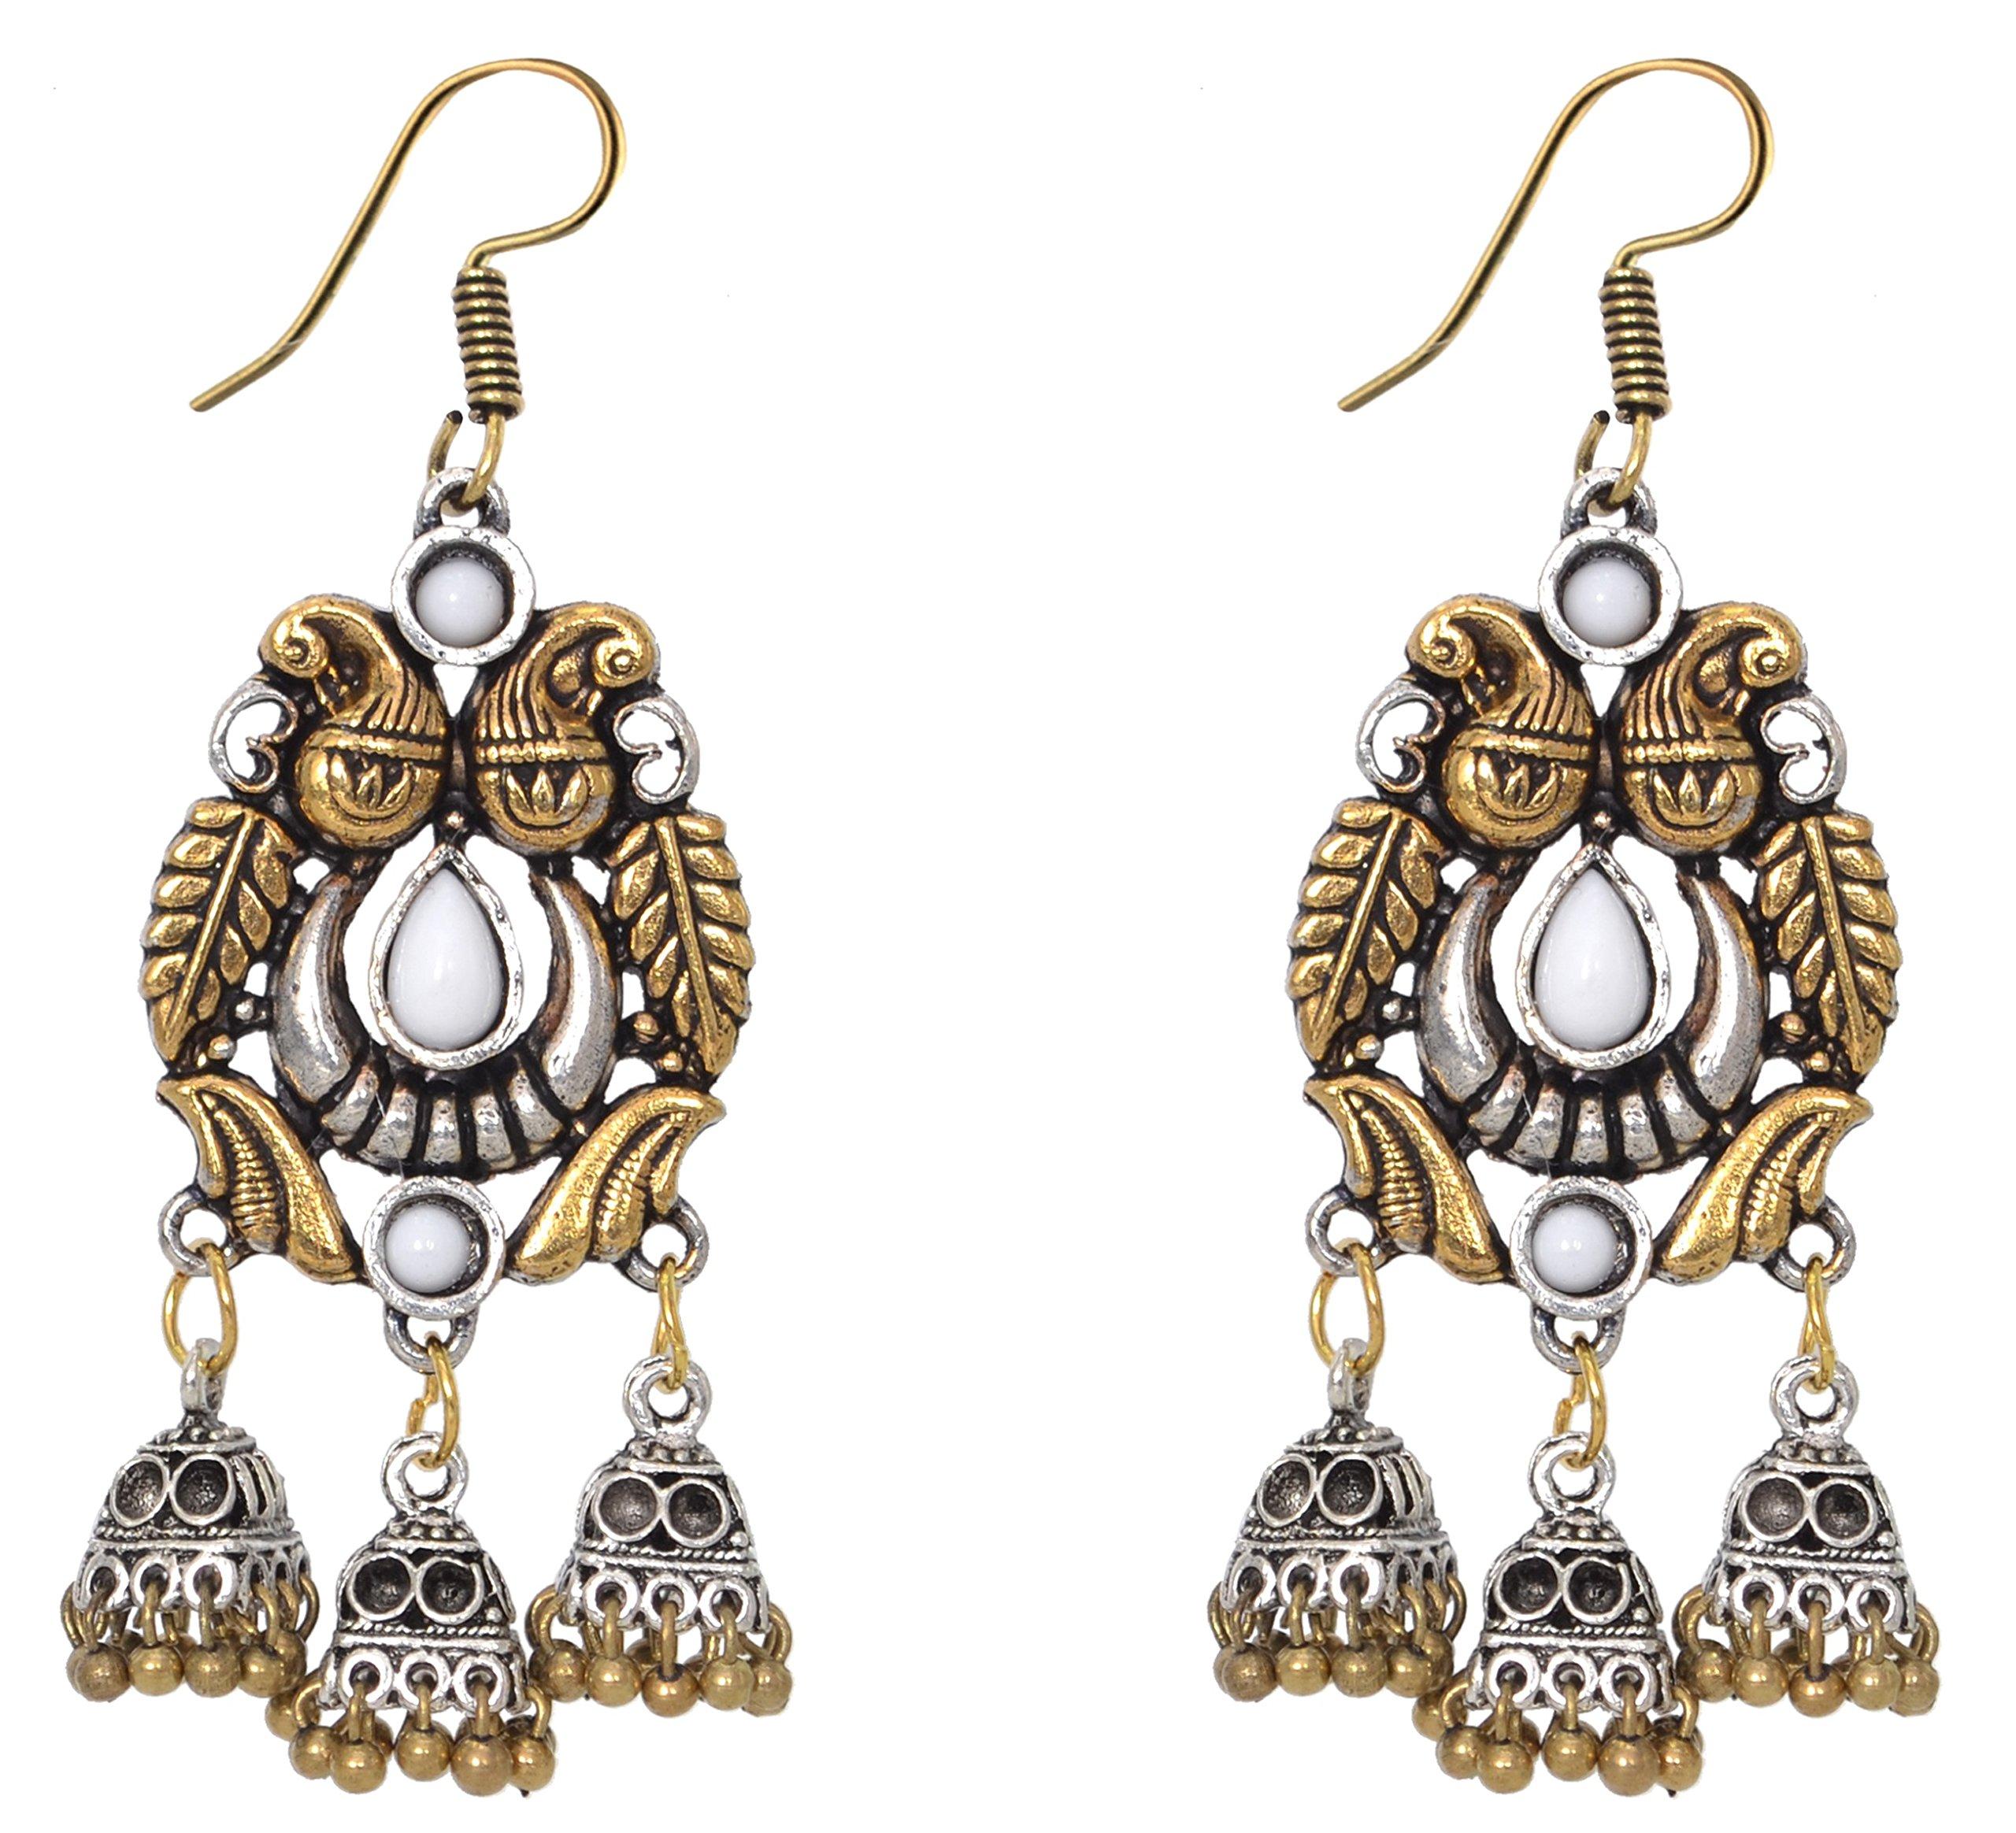 Sansar India Oxidized Dual Tone Triple Jhumka Indian Earrings Jewelry for Girls and Women